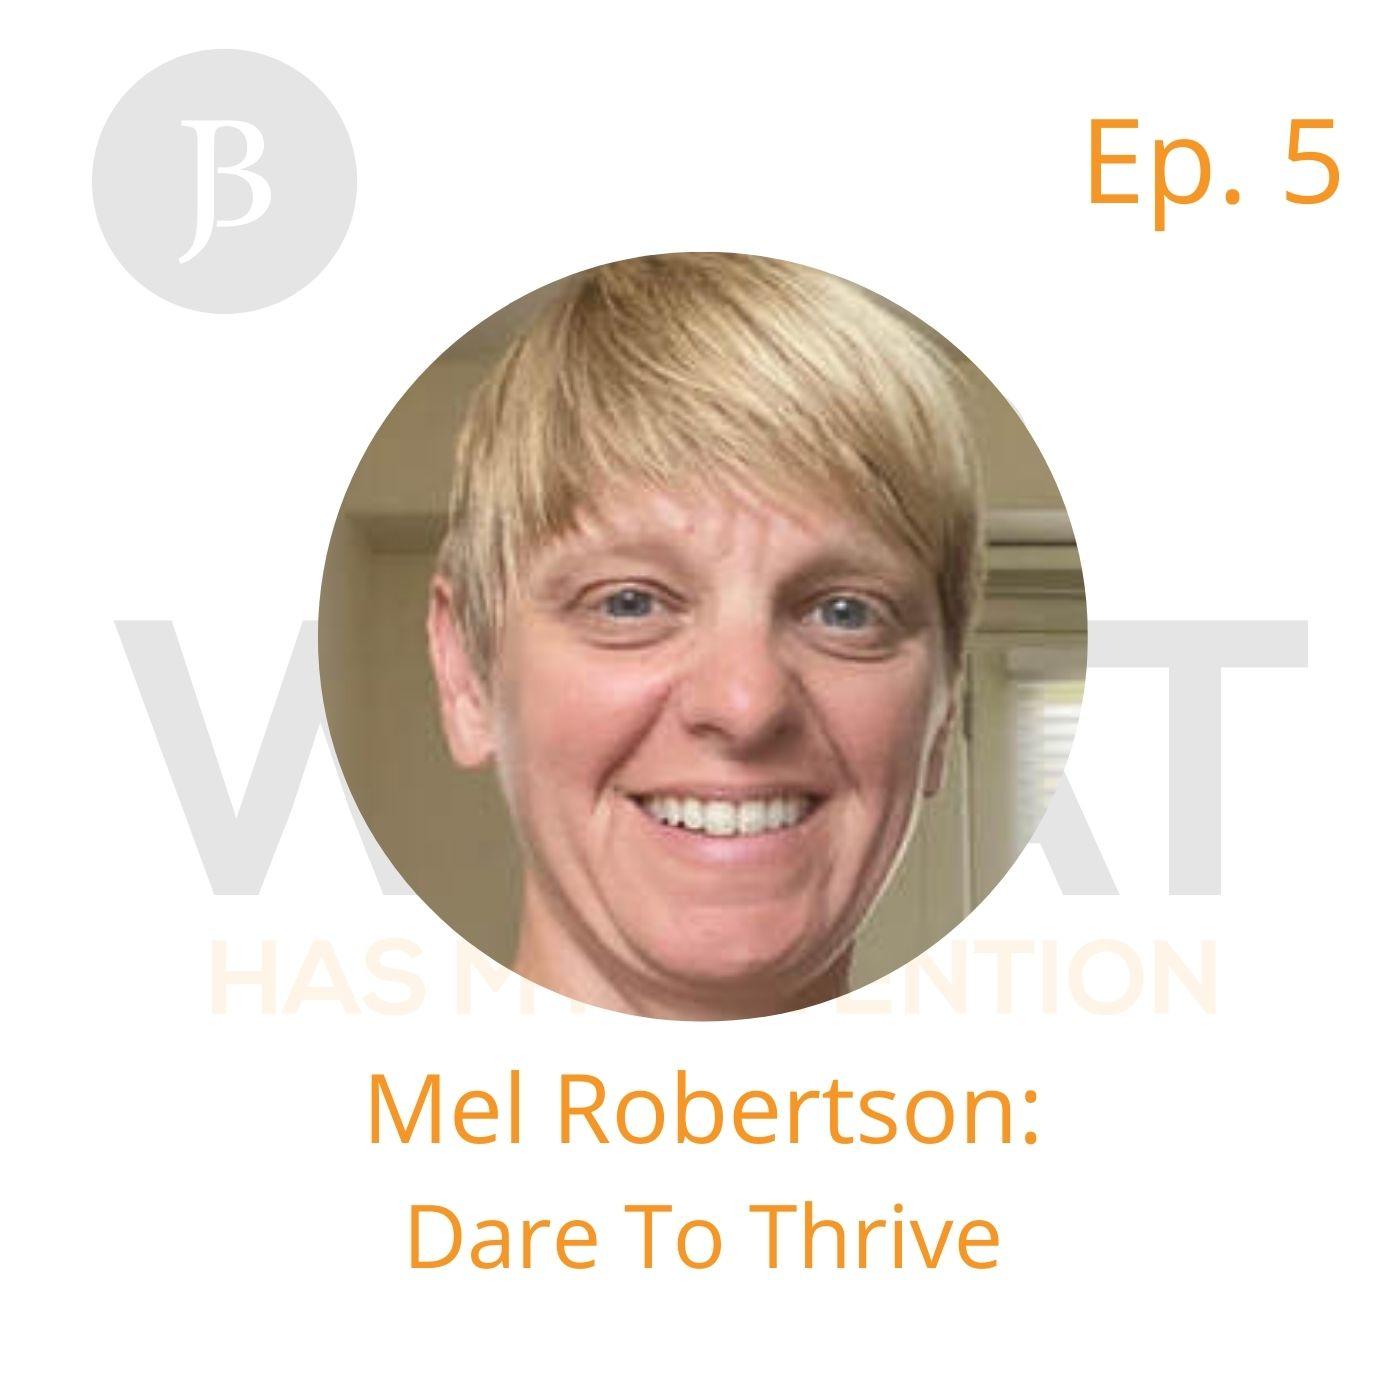 Ep. 5 Mel Robertson: Dare To Thrive